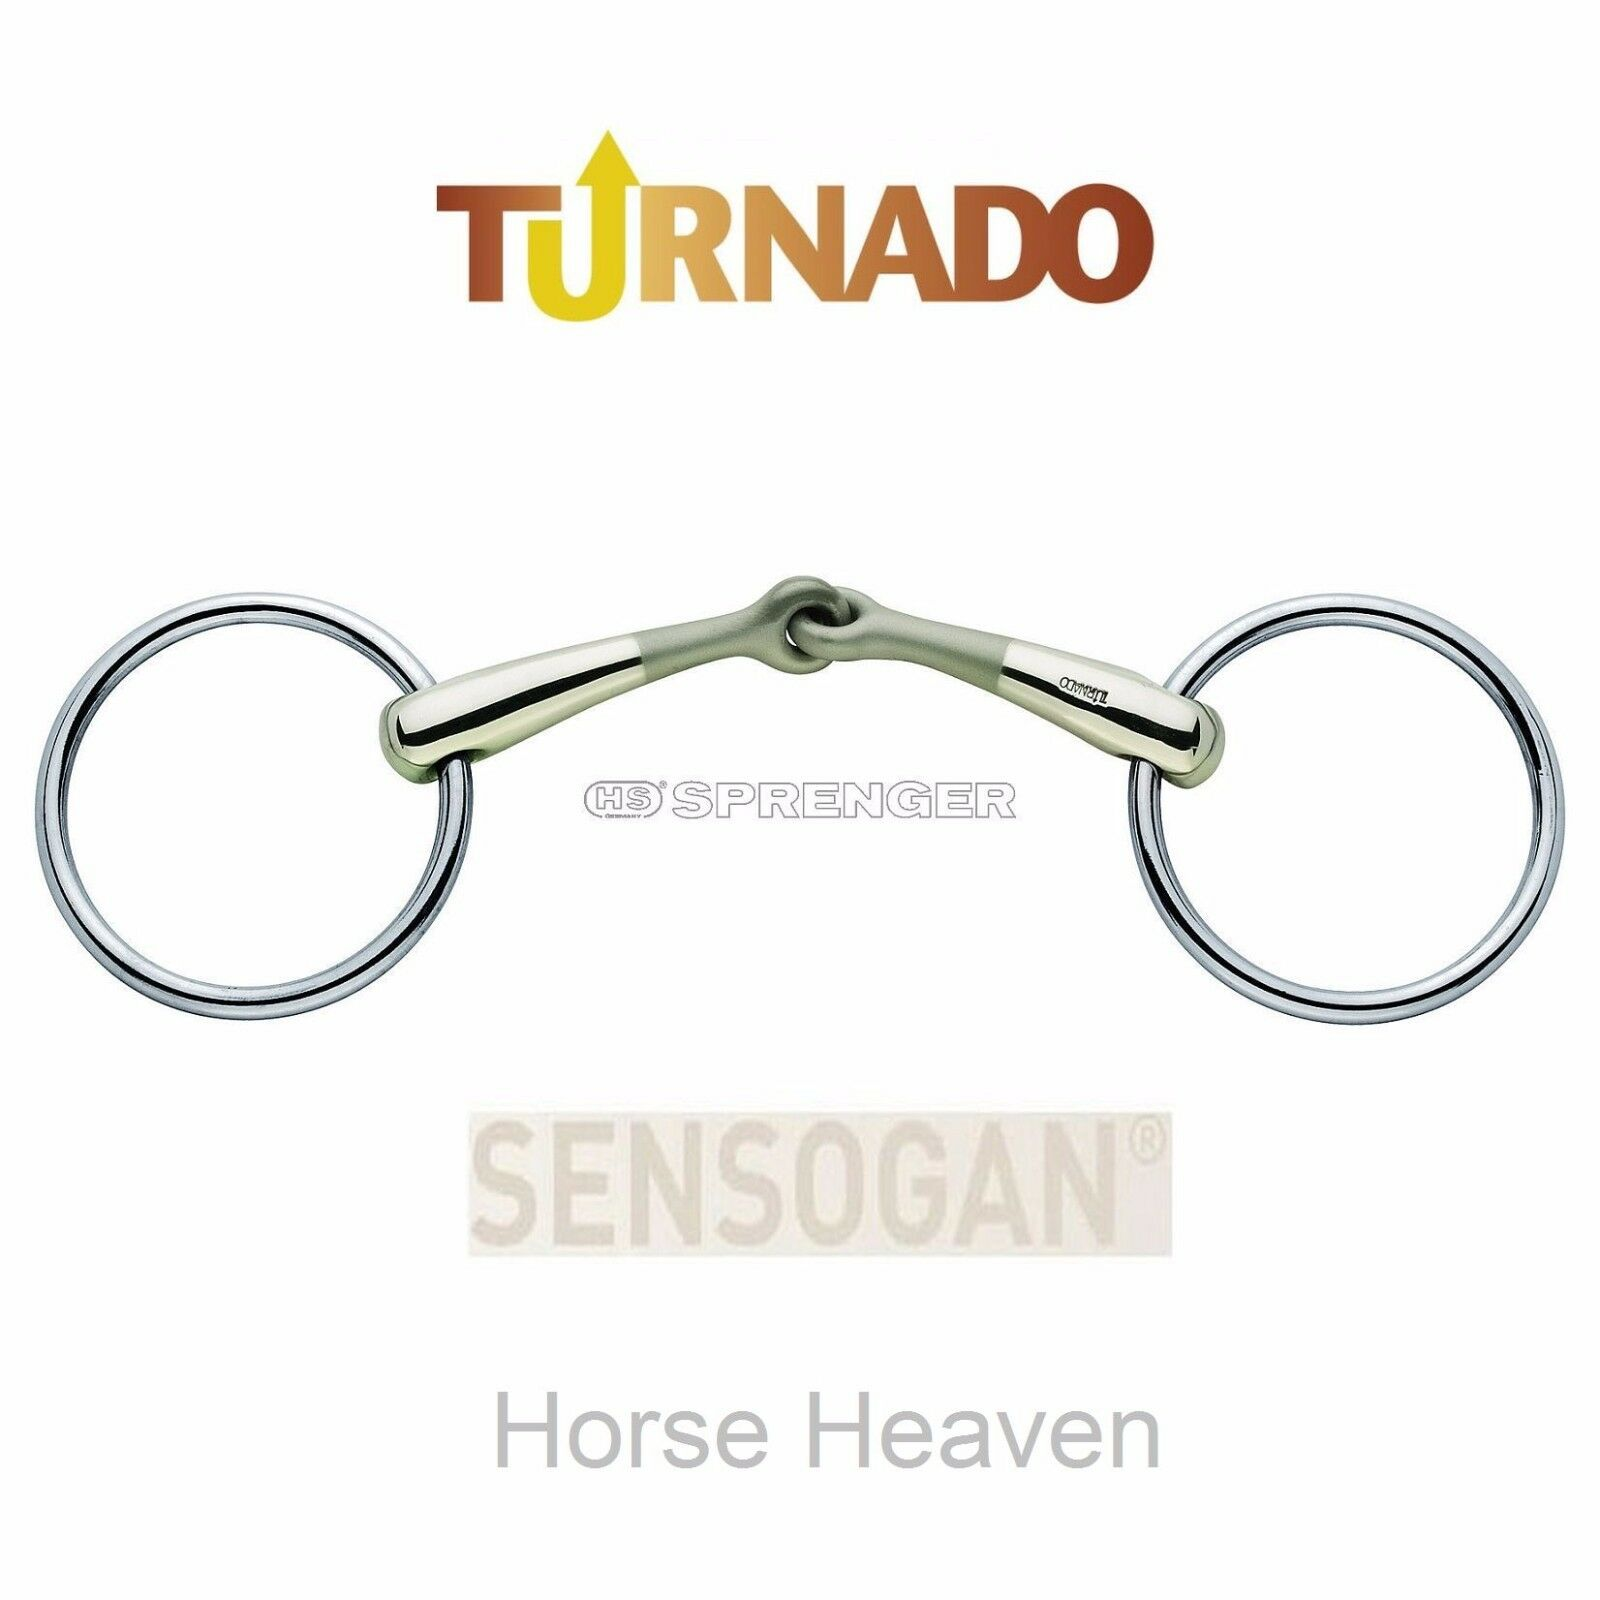 Sprenger Turnado Loose Ring Bradoon Bit, 14mm, All Sizes, New in Sensogan 40286